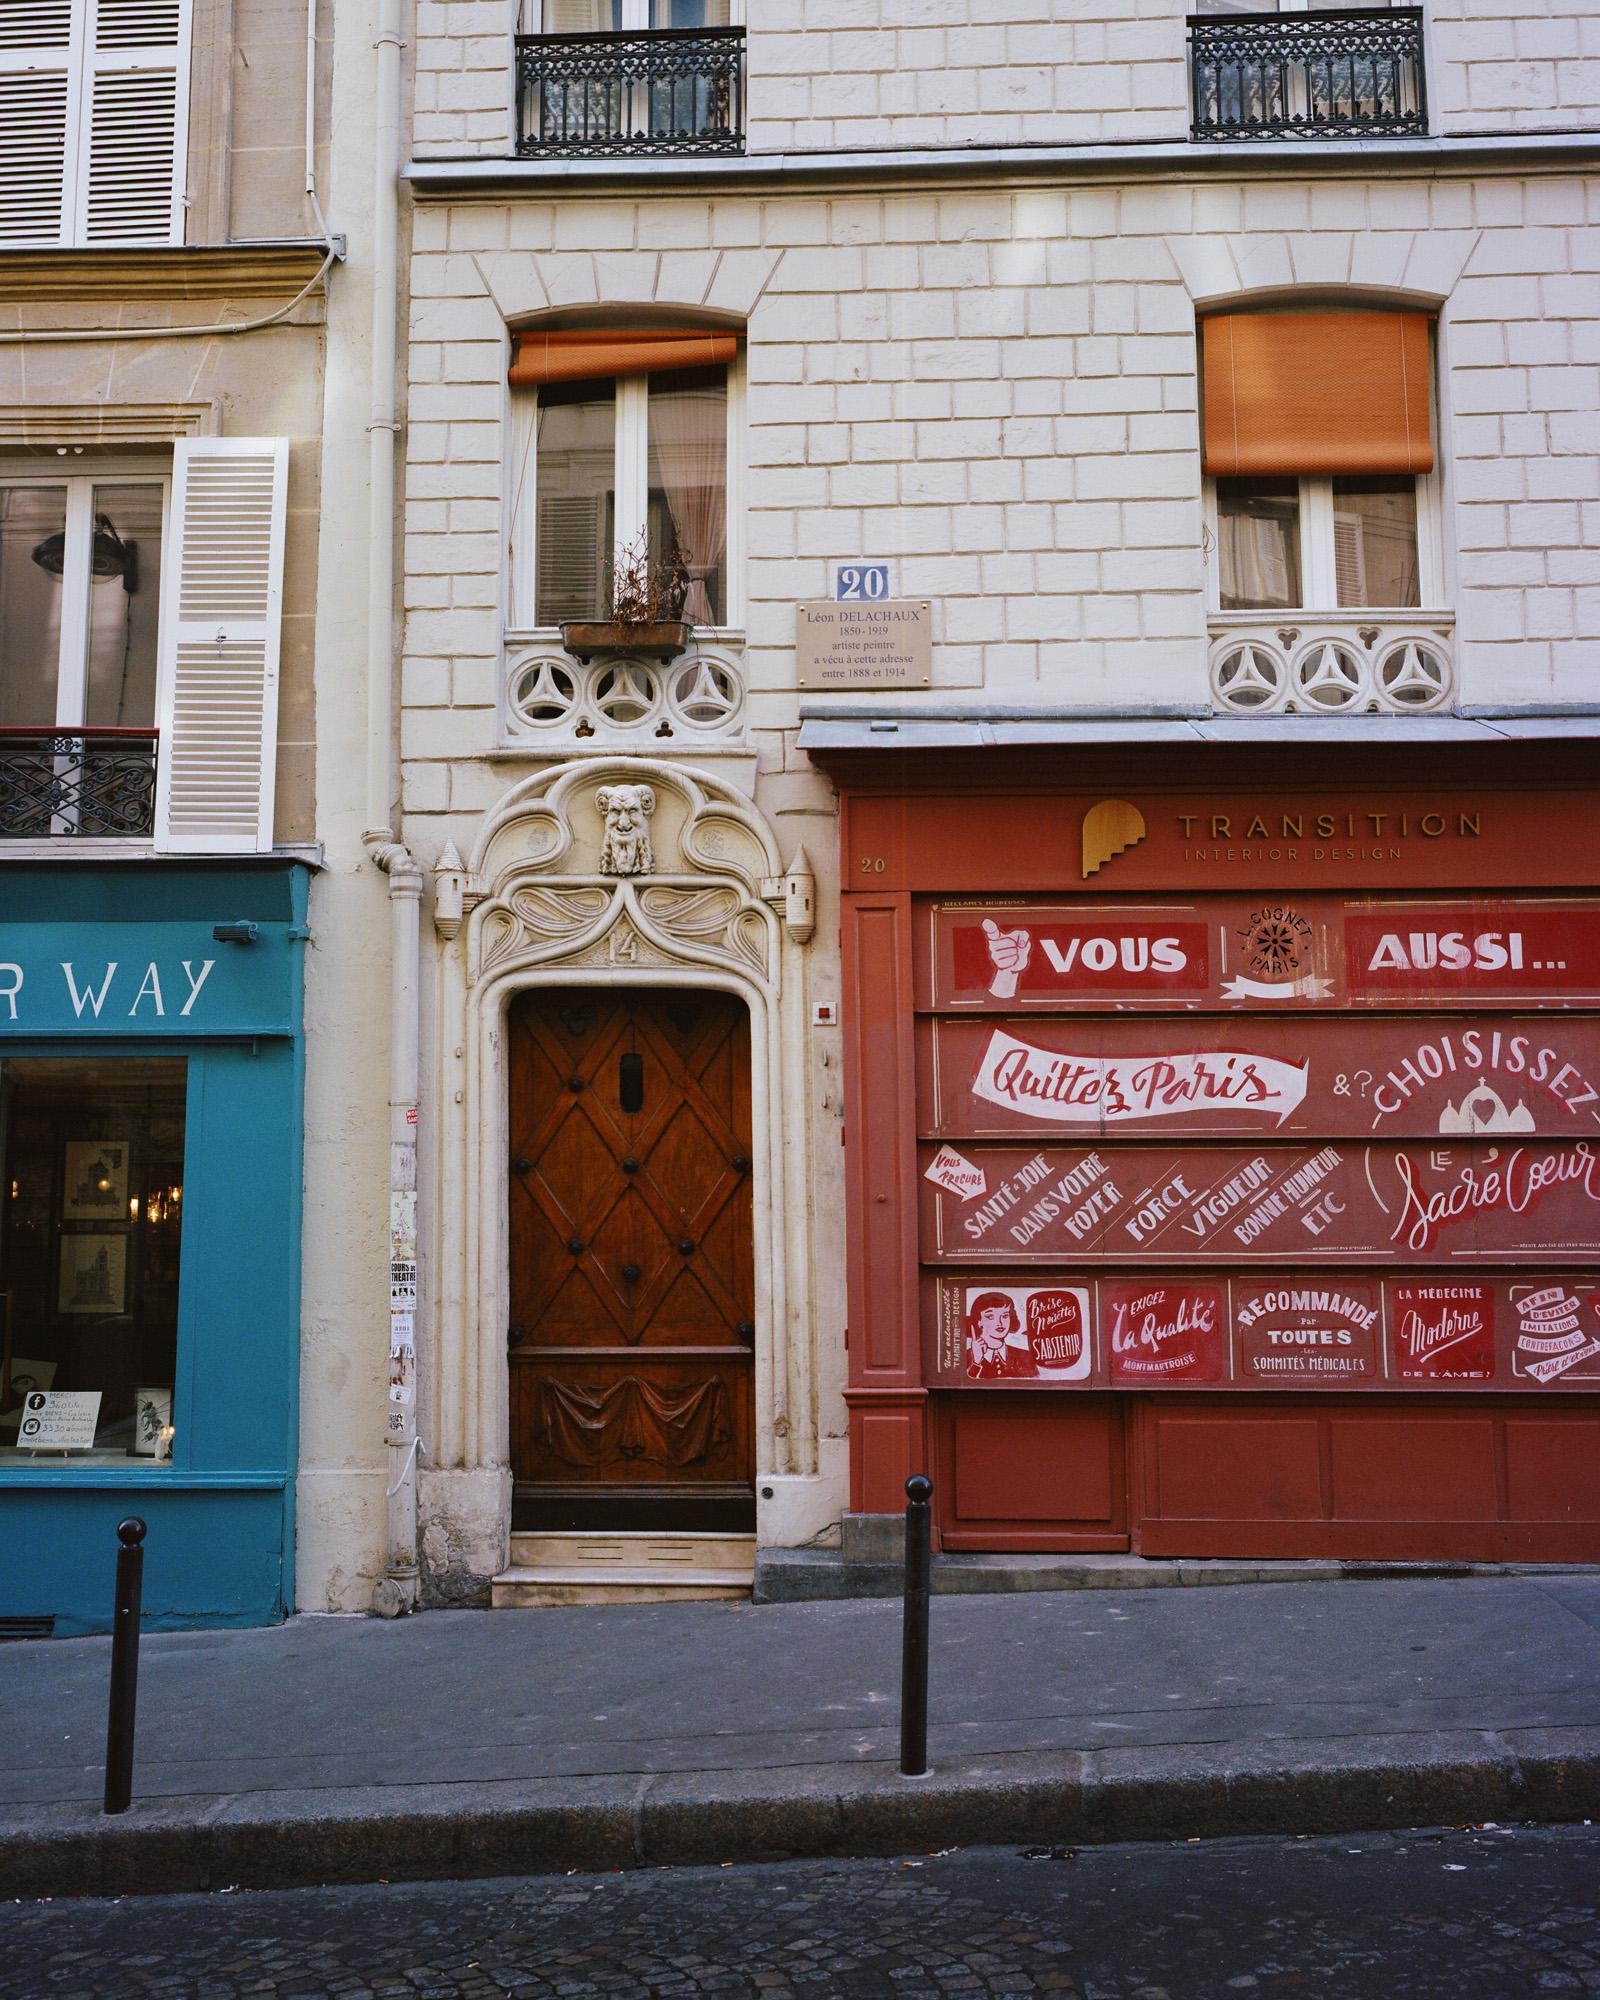 Façade du 20 rue Durantin, à Montmartre